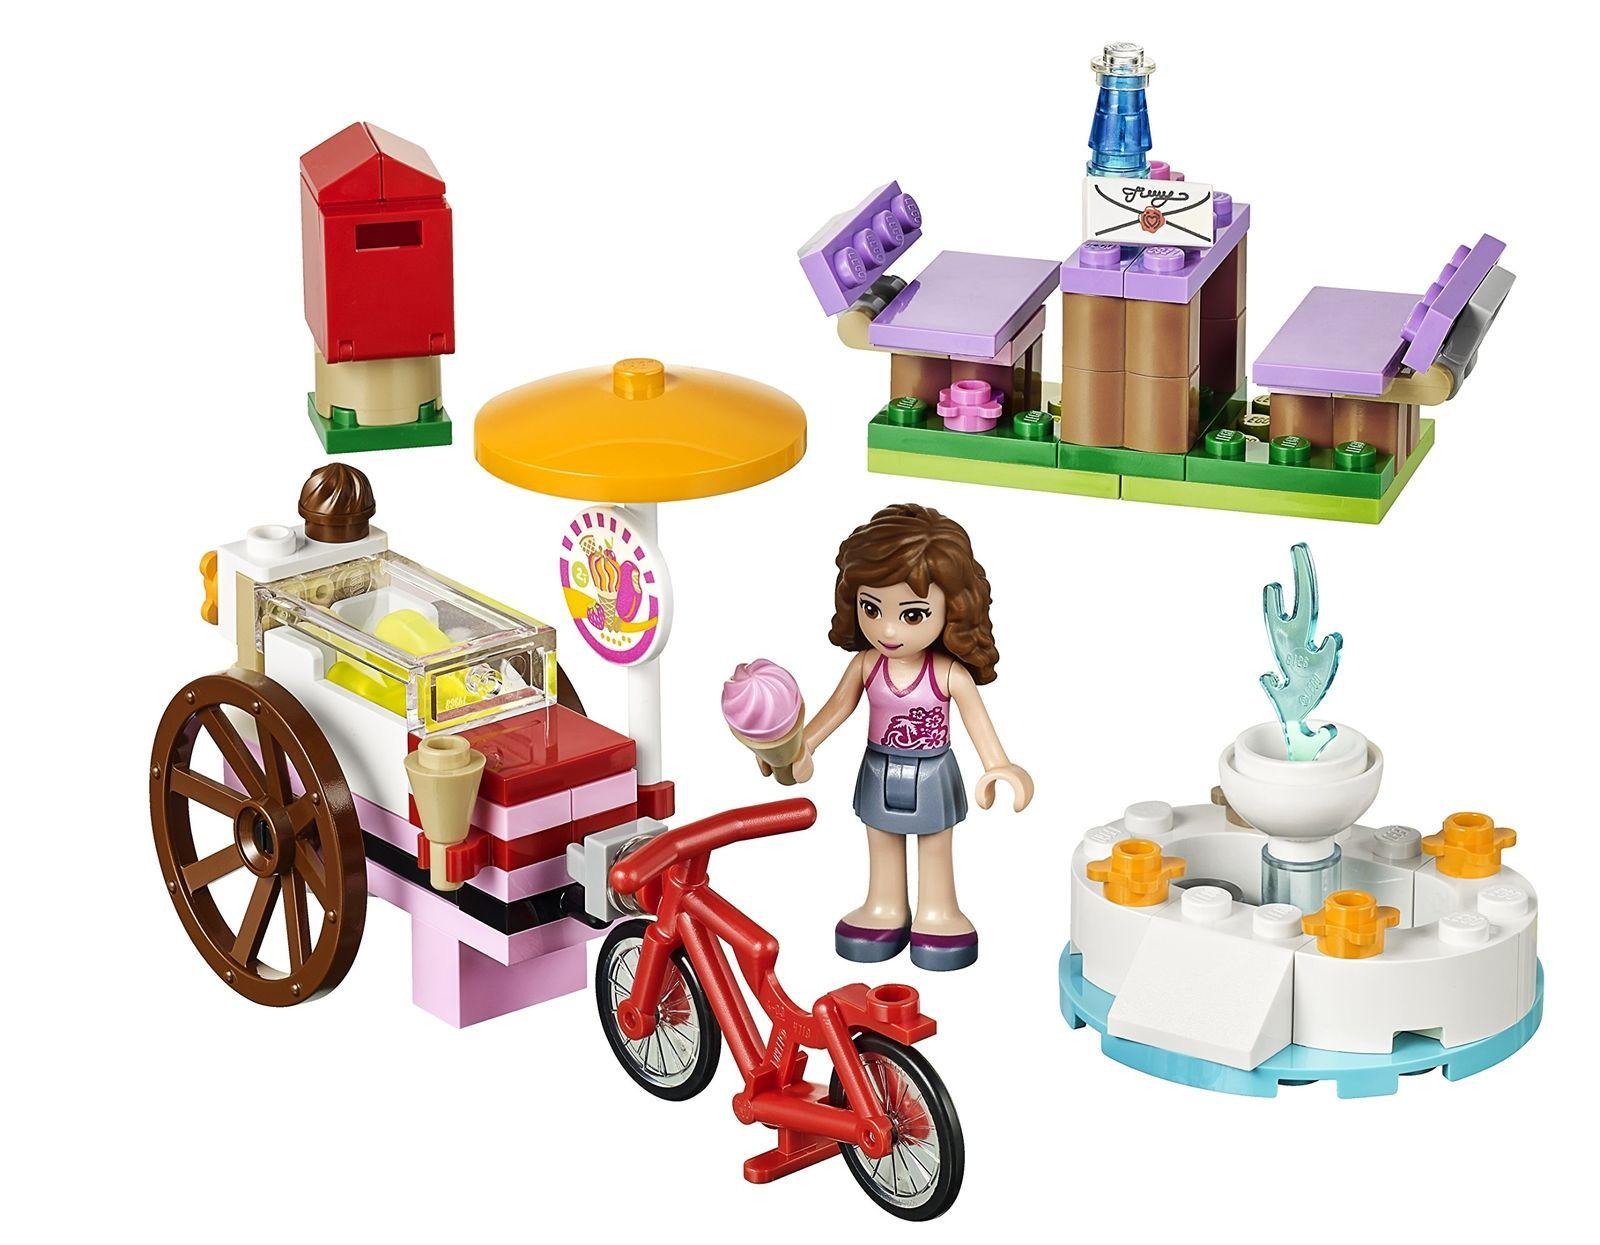 LEGO Friends Set #41030 Olivia's Ice Cream Bike [New] Building Toy